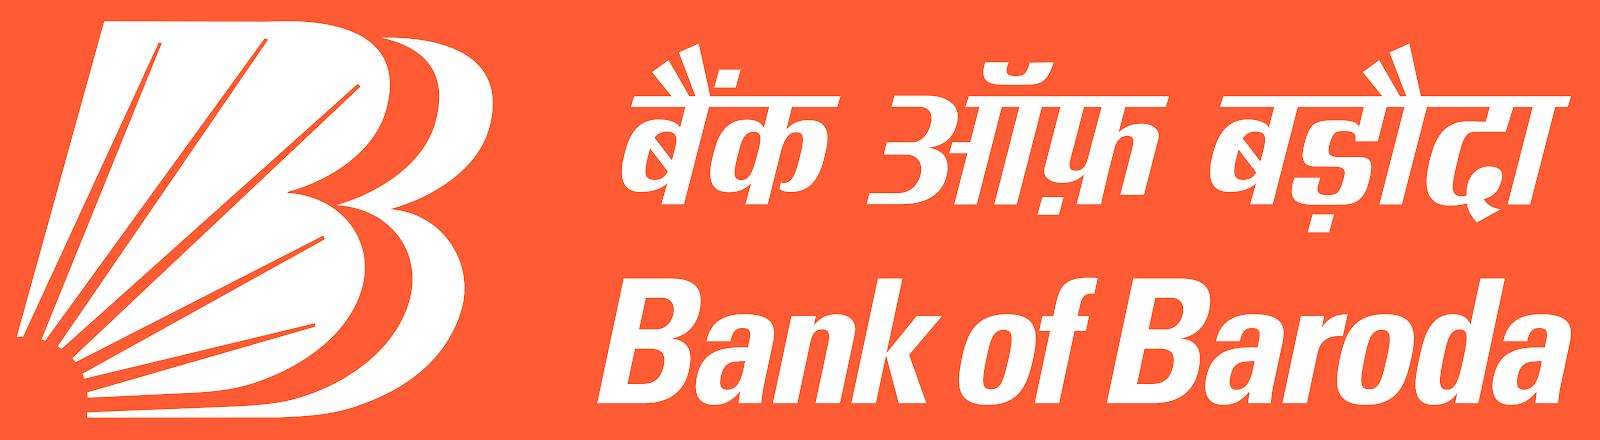 Bank of Baroda Mudra Loan Application West Bengal